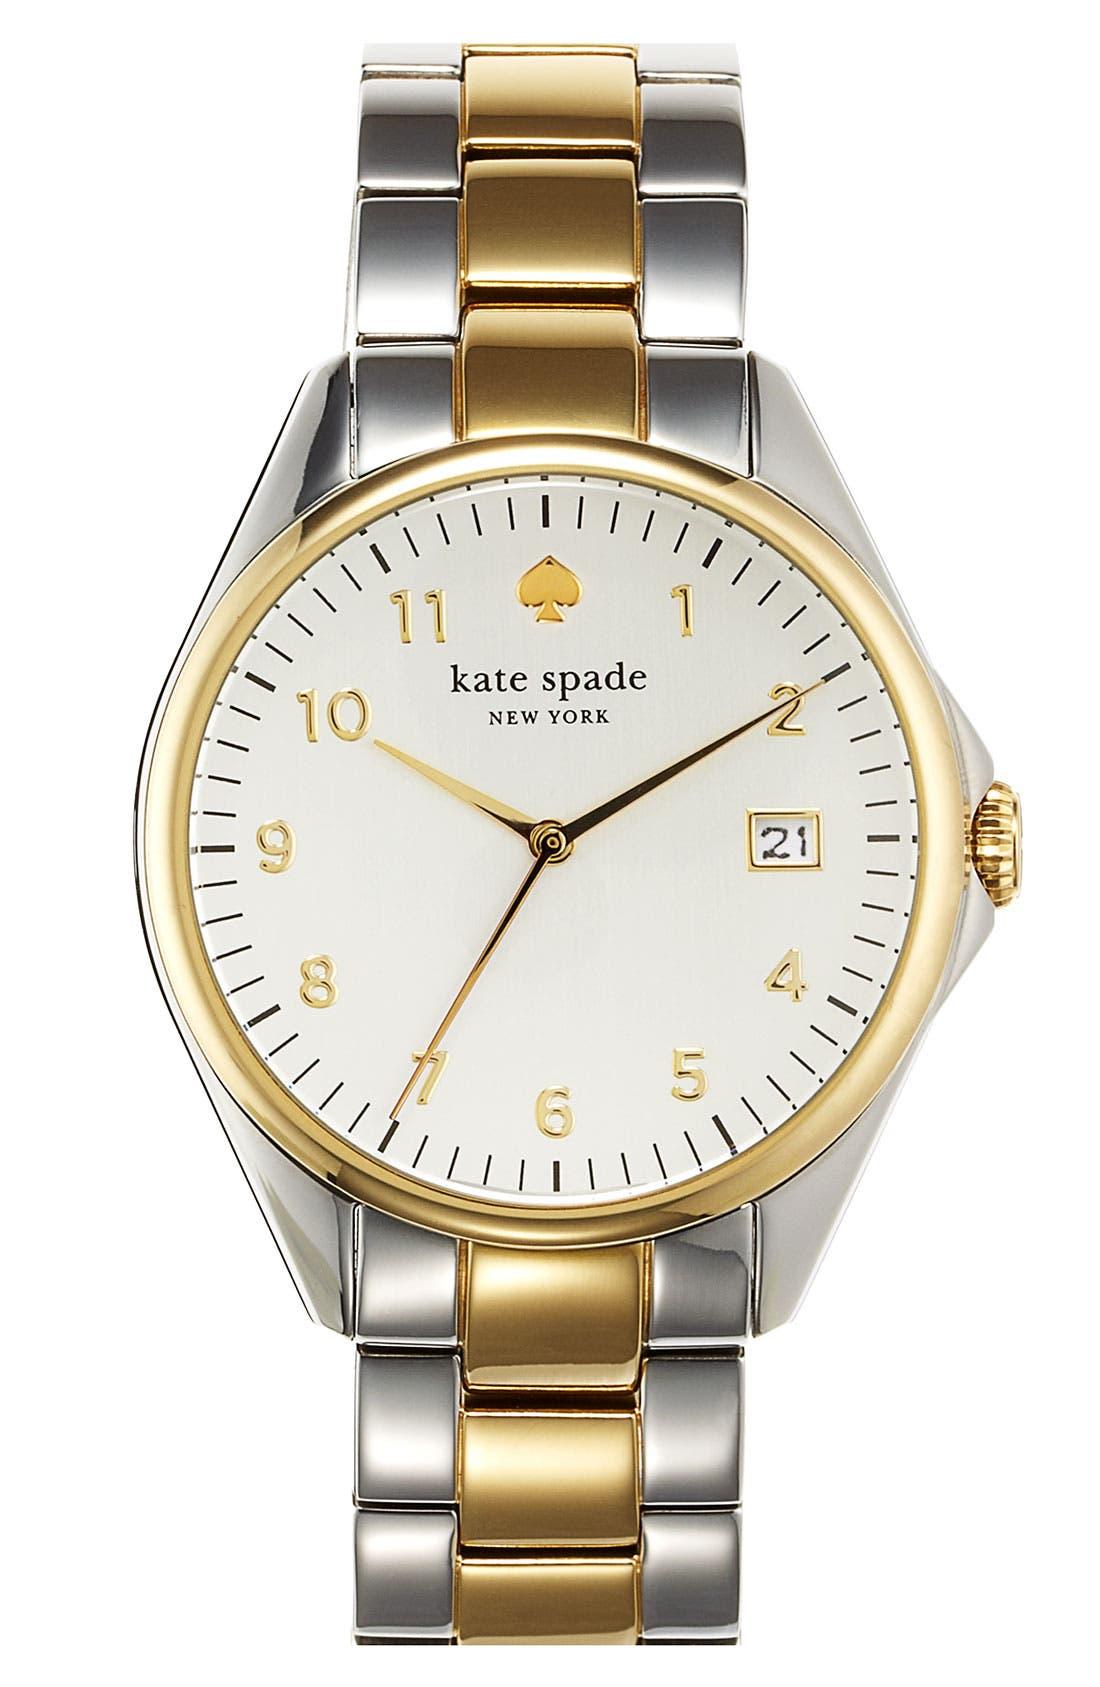 Main Image - kate spade new york 'seaport grand' bracelet watch, 38mm